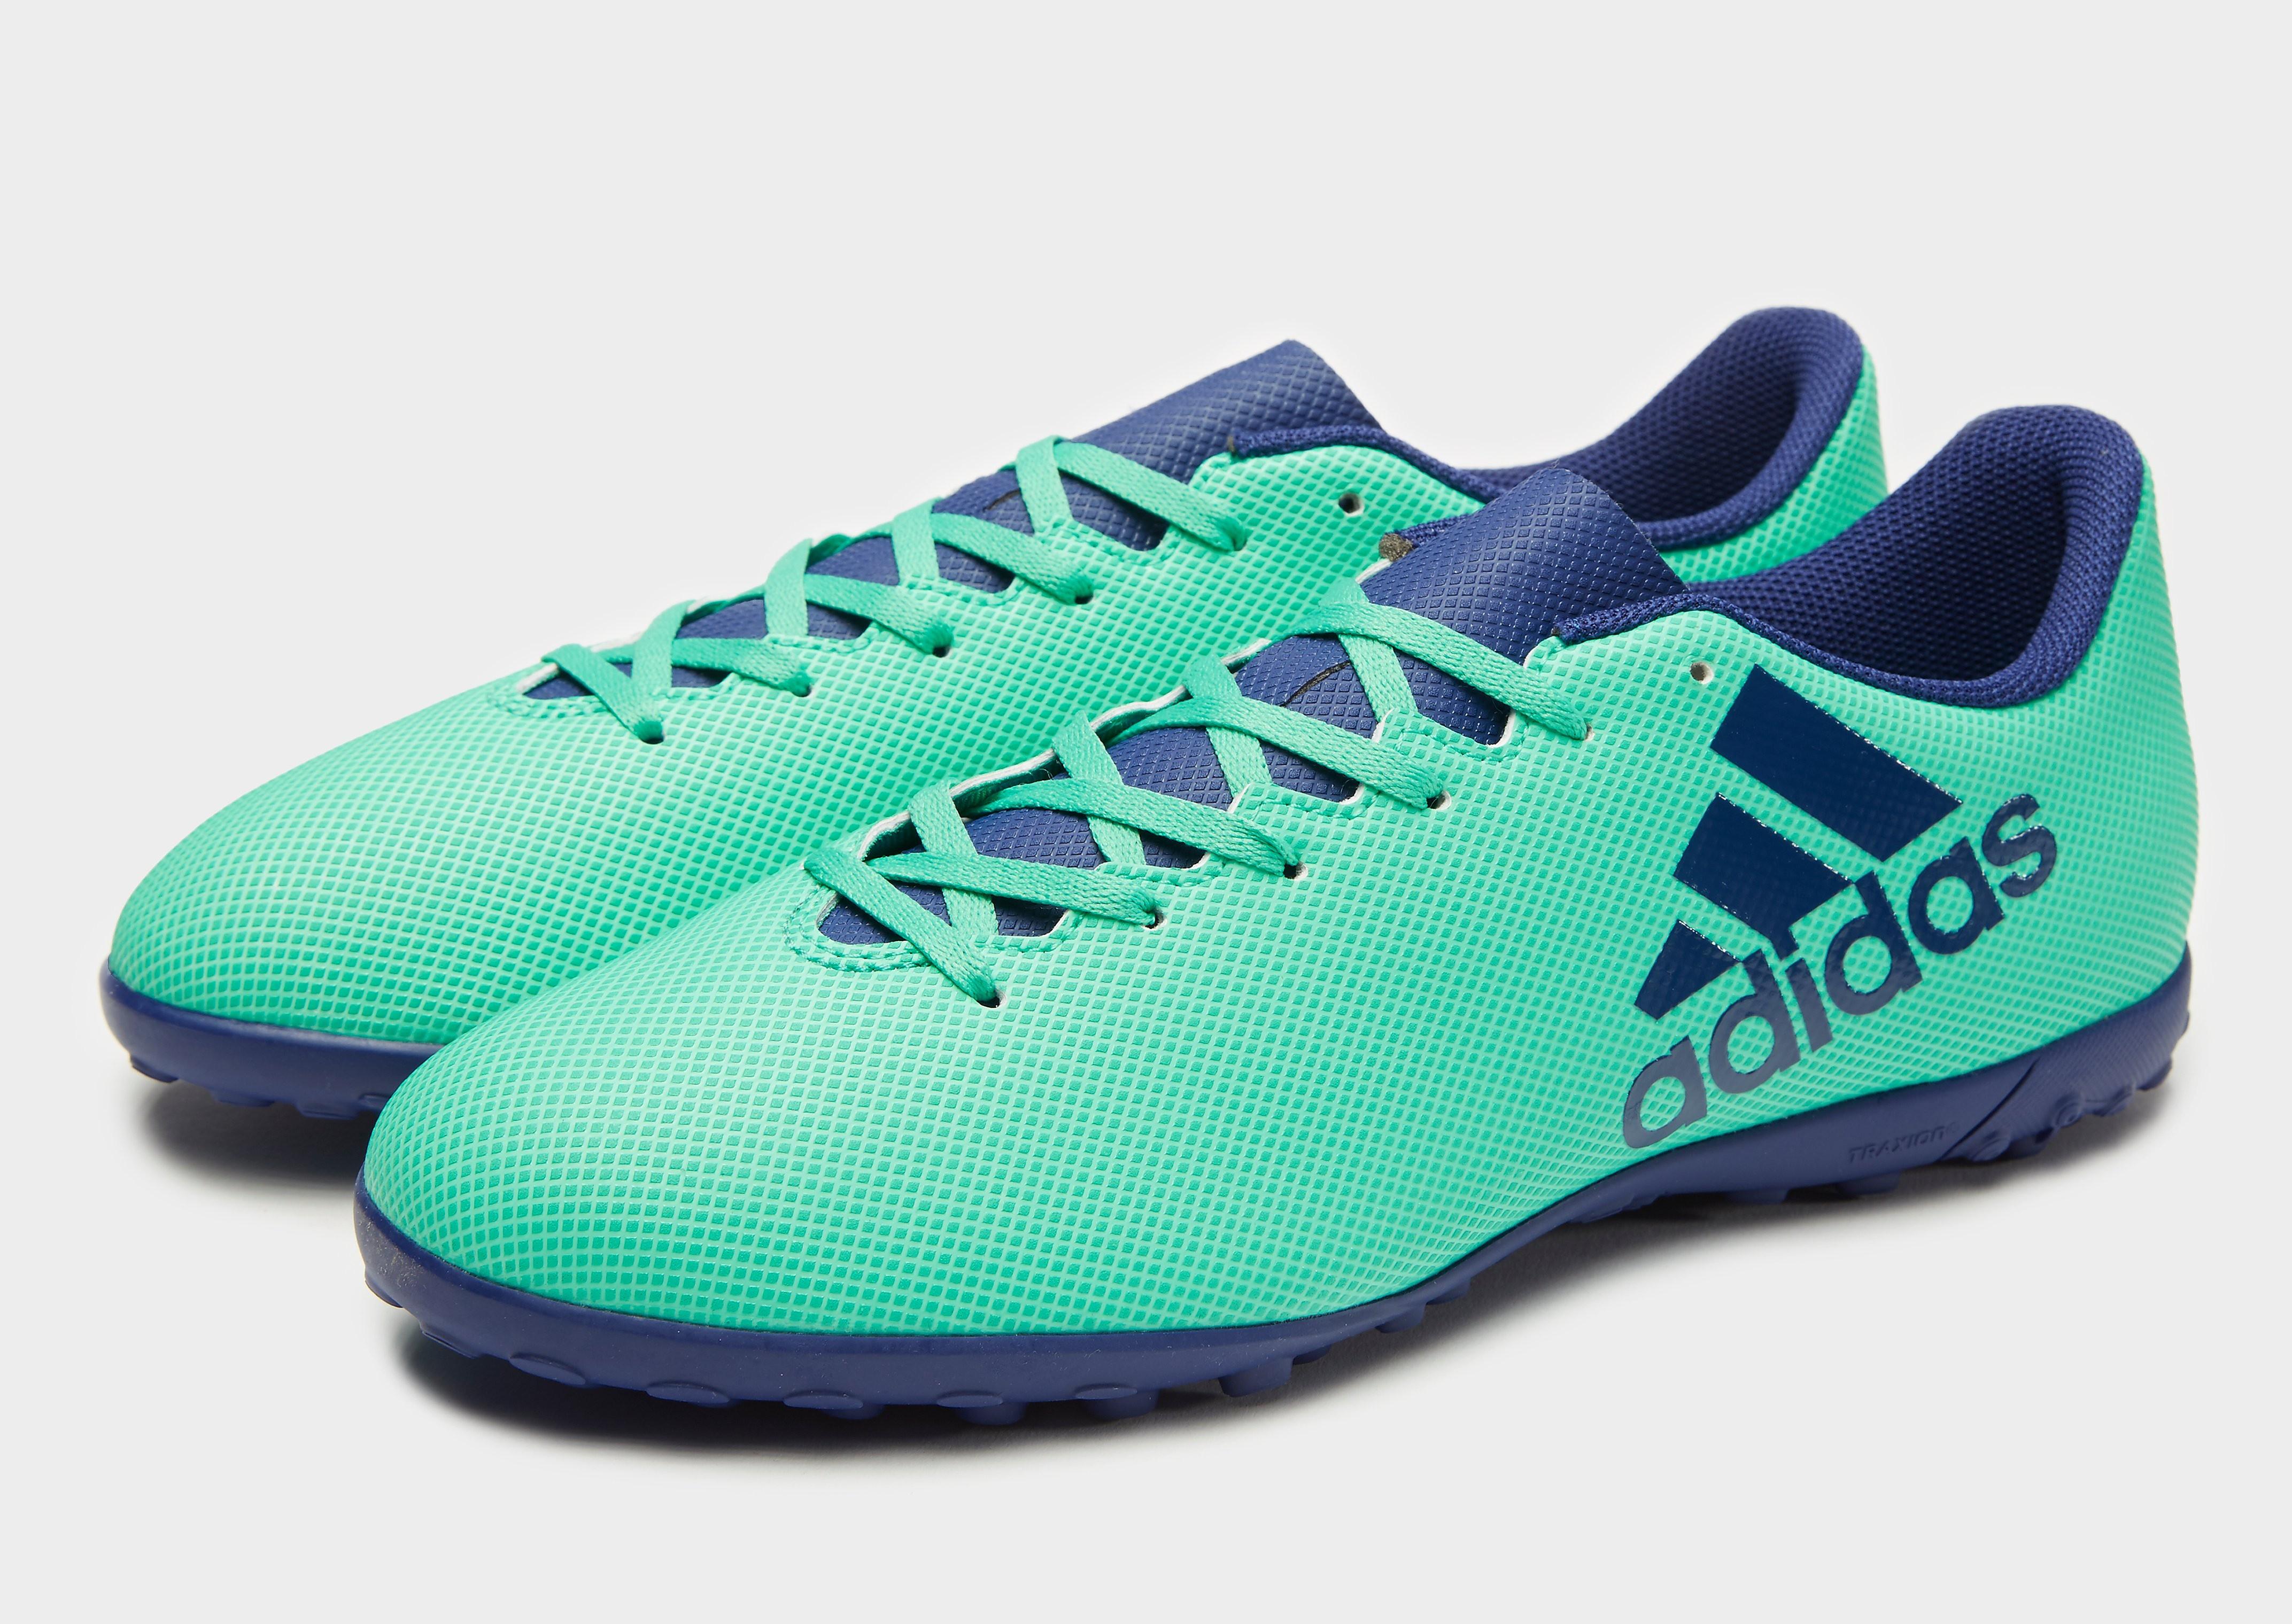 adidas Deadly Strike X 17.4 TF (RESERVA)